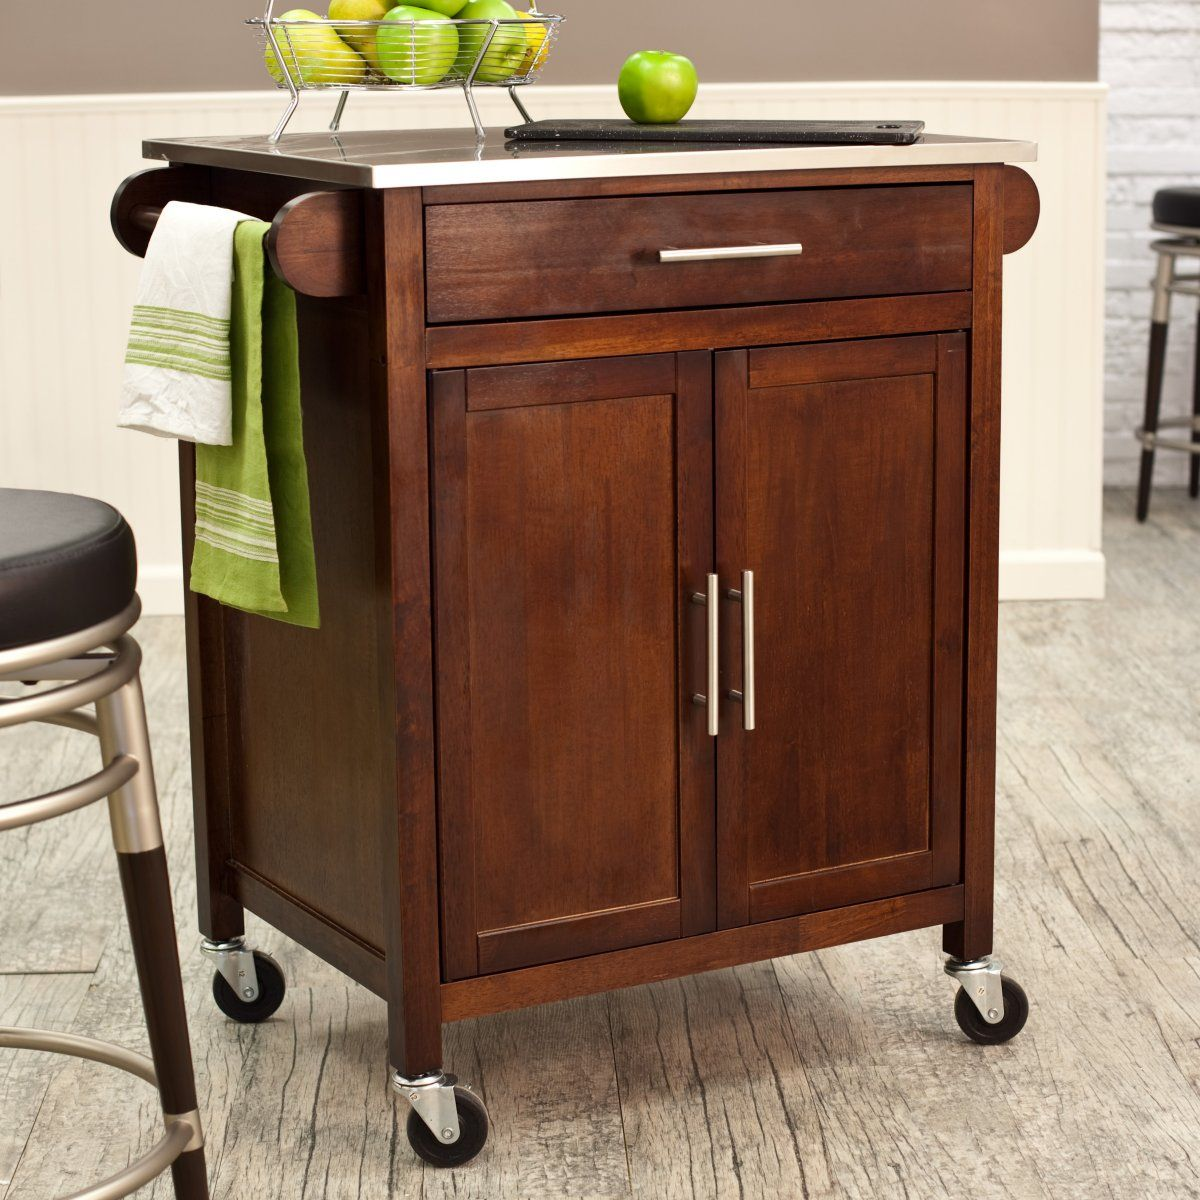 Pantry Storage Designs Portable Kitchen Island: Espresso Mid-Size Kitchen Island With Stainless Steel Top